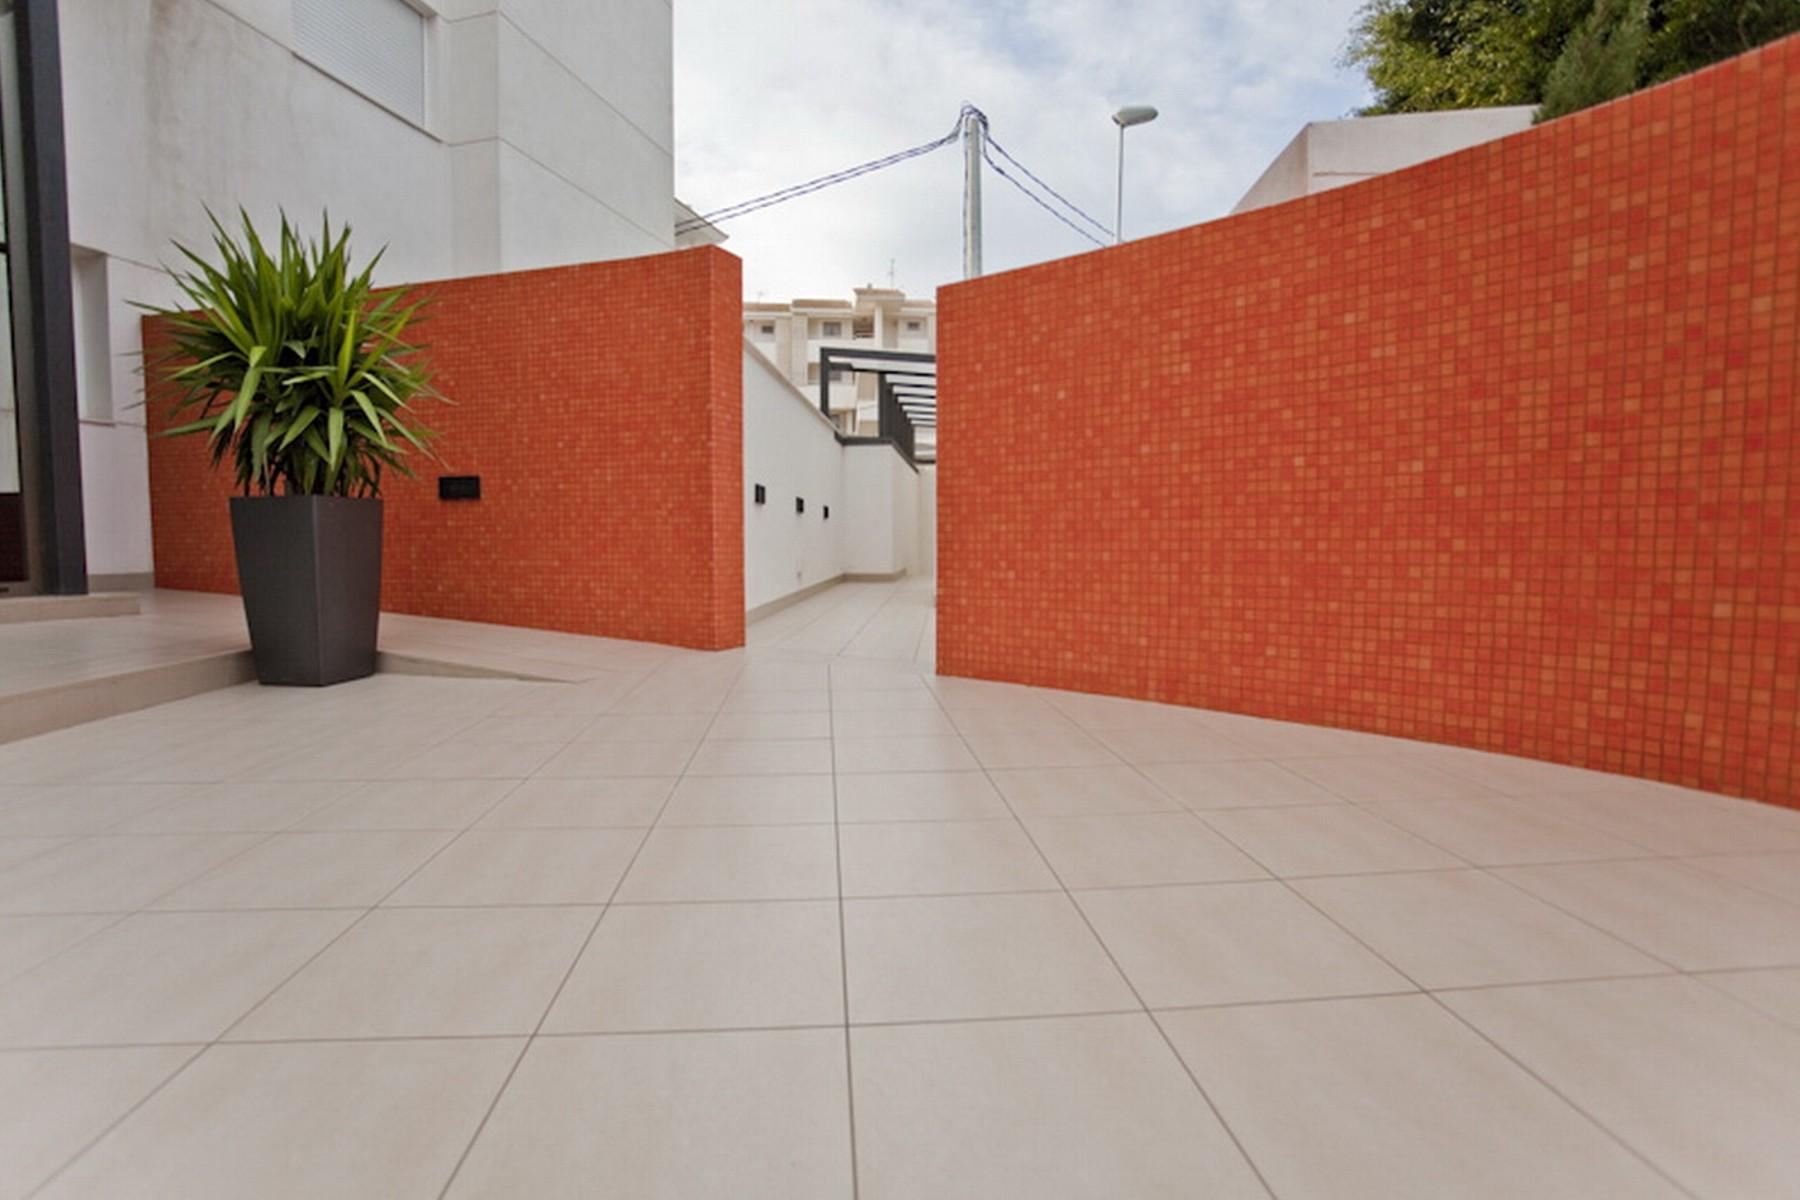 Imaginarq-155-Edificio-Viviendas-Altea-Alicante-09A